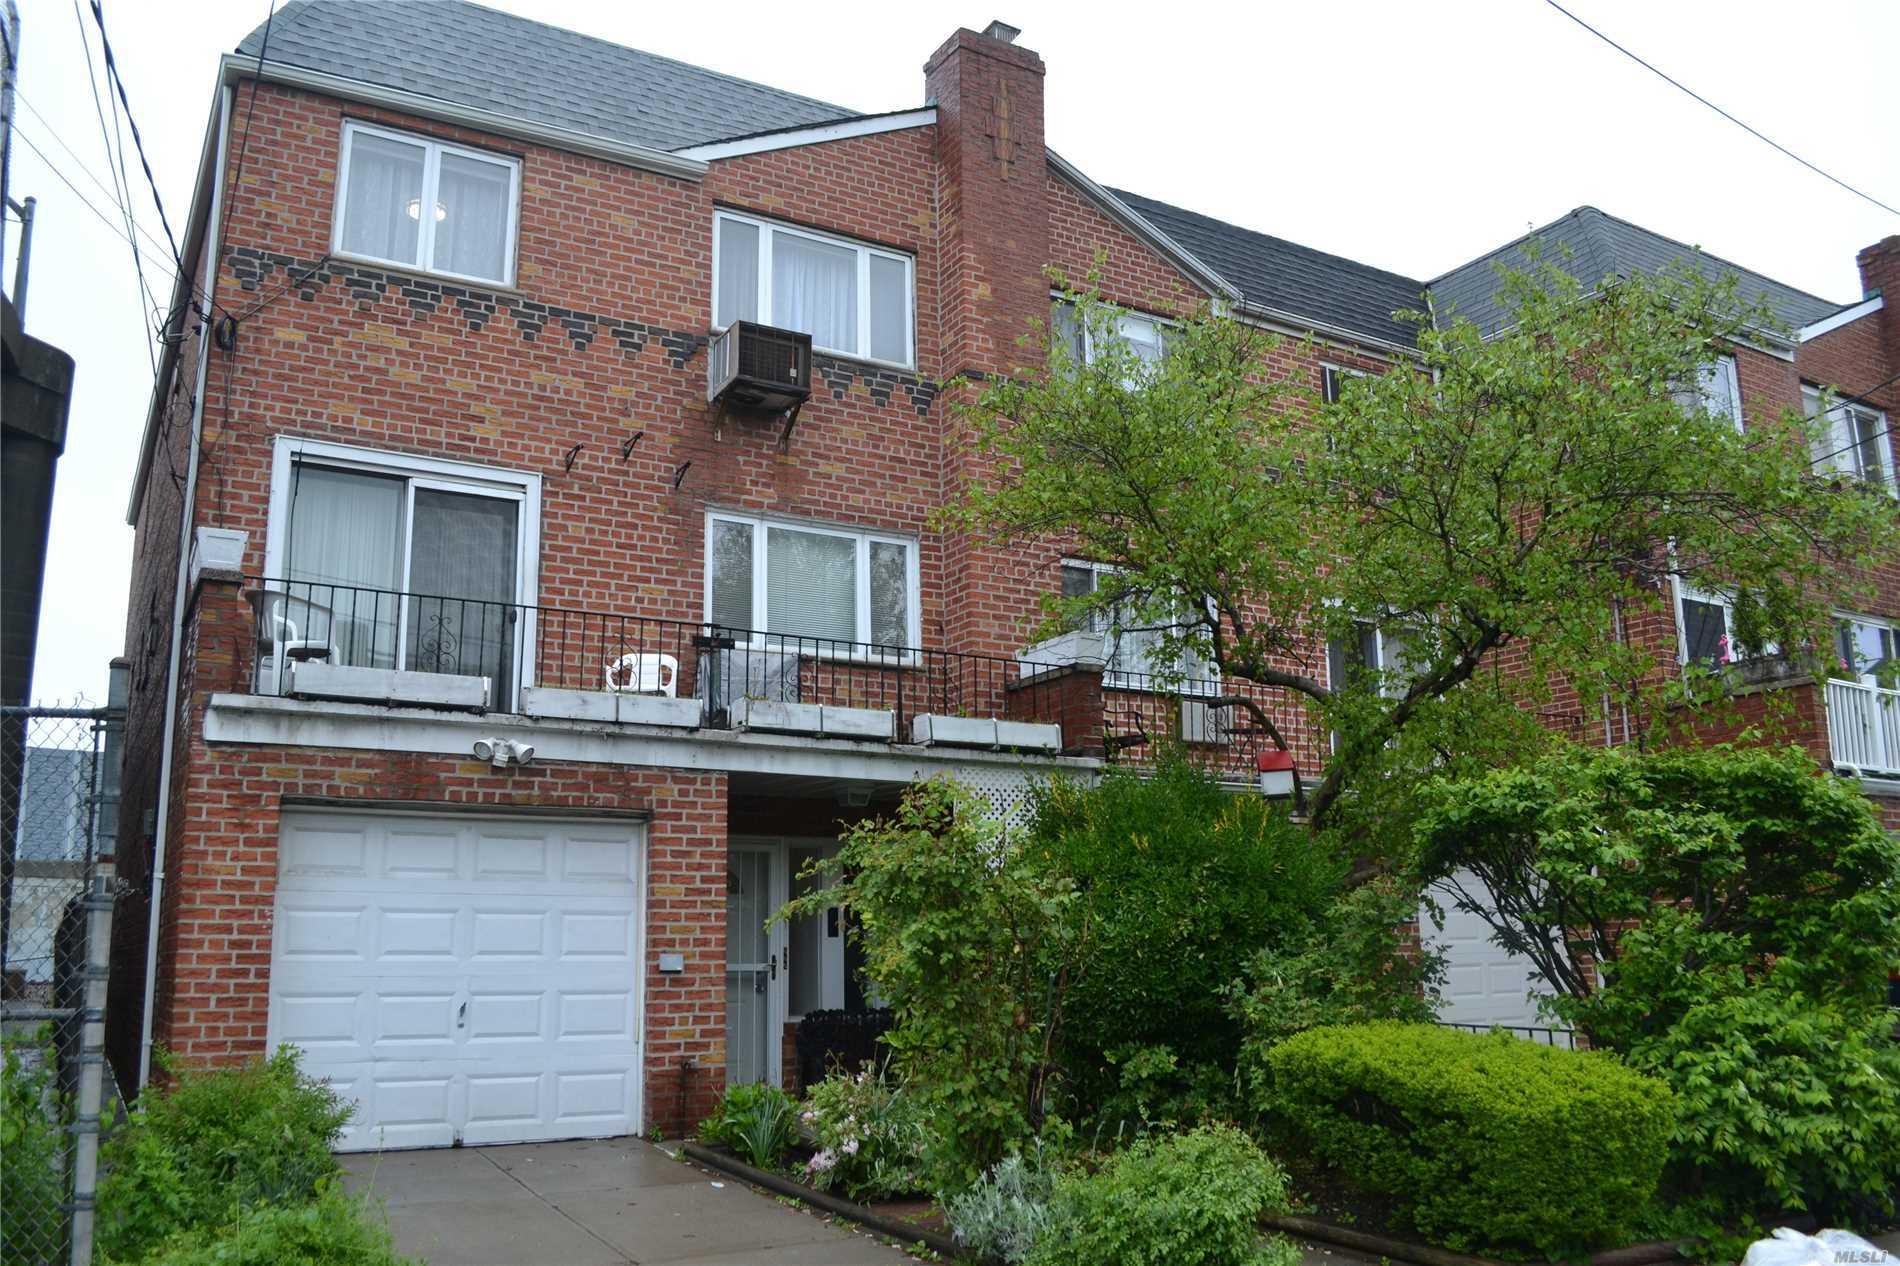 Property for sale at 71-19 58th Road, Maspeth NY 11378, Maspeth,  New York 11378